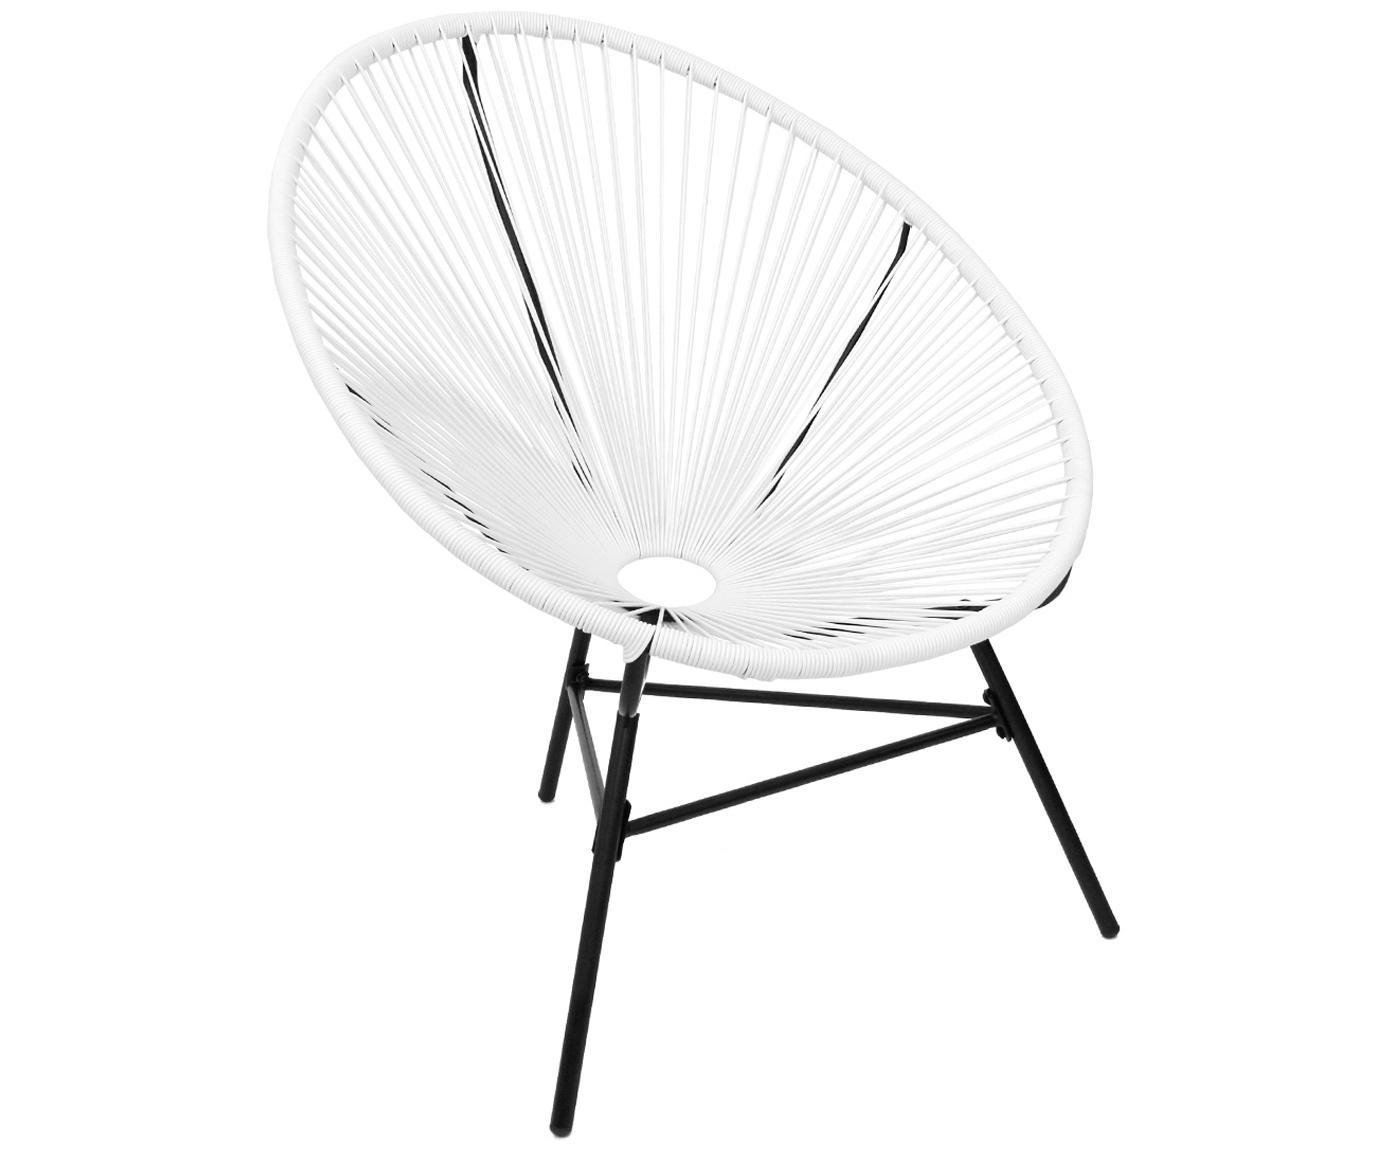 Retro fauteuil Bahia, Frame: Metaal, Zitvlak: Polyethyleen-vlechtwerk, Vlechtwerk: Wit. Frame: Zwart, 81 x 88 cm